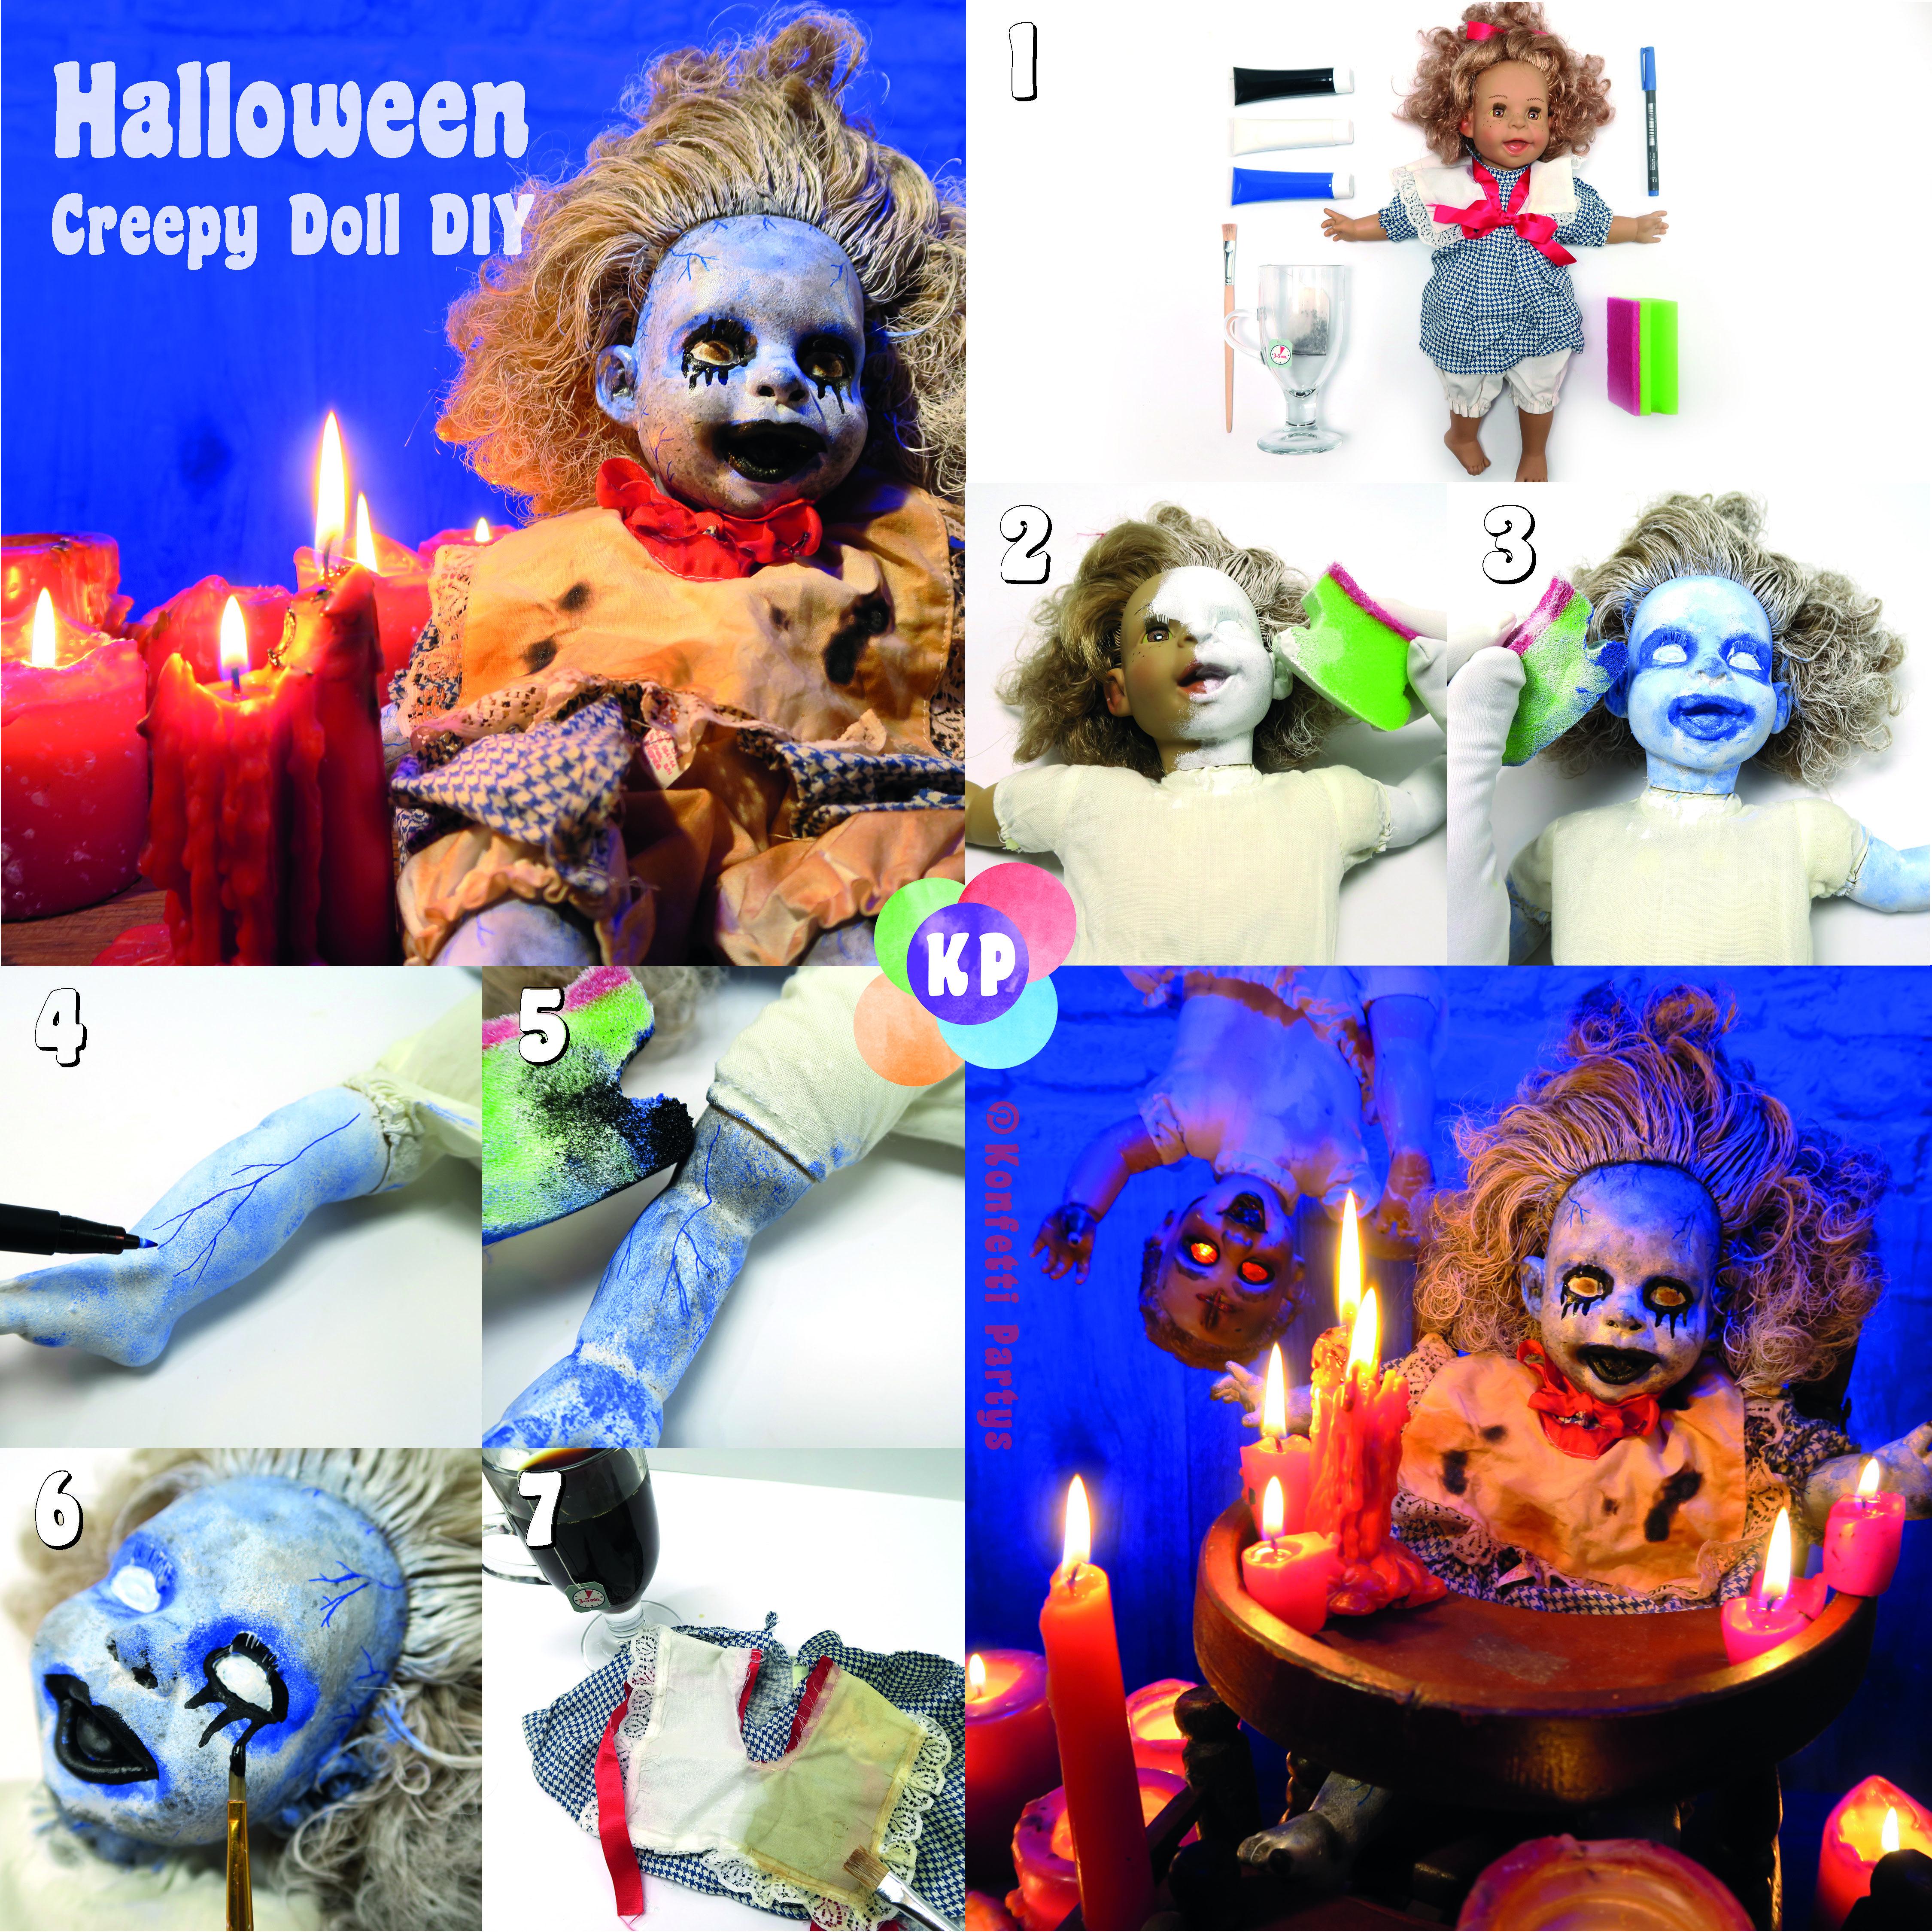 Creepy Doll Diy Gruselige Puppe Halloween Party Deko Basteln Craft Halloweendiy Konfettipartys Diy Hal Halloween Deko Halloweendeko Halloween Selber Machen